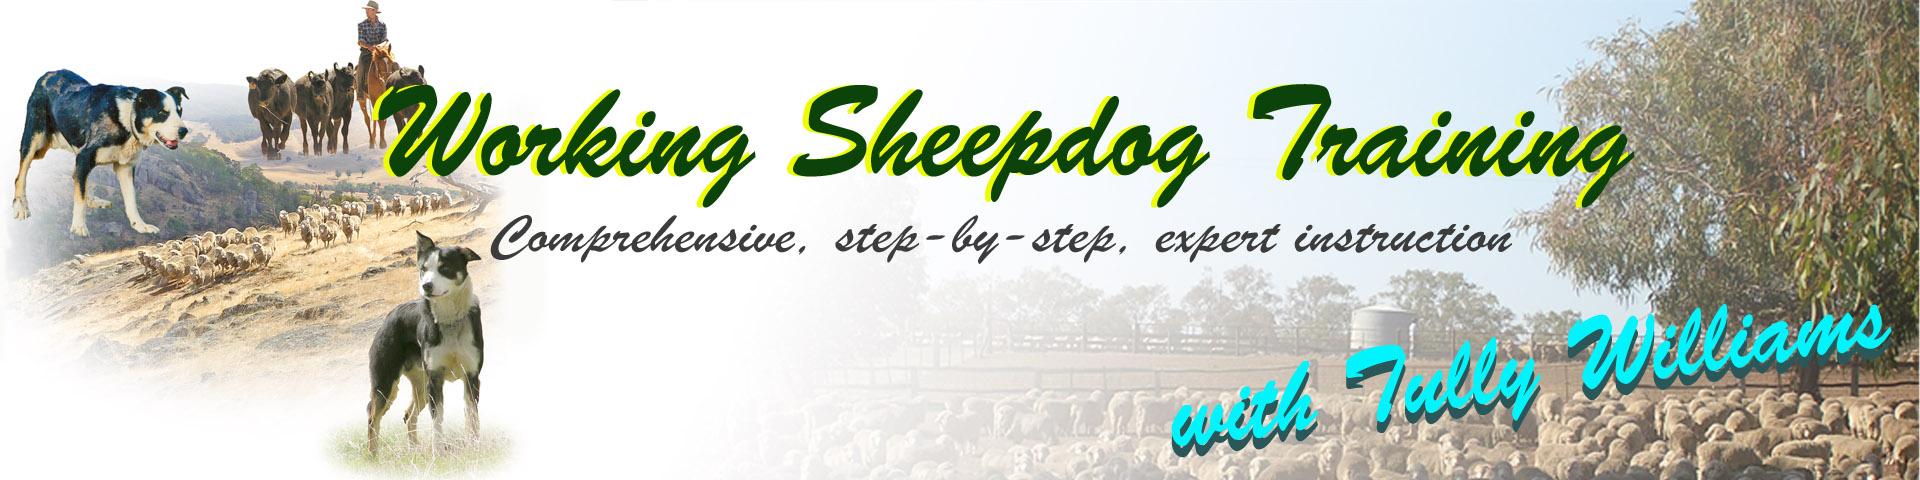 Working sheepdog training videos header image